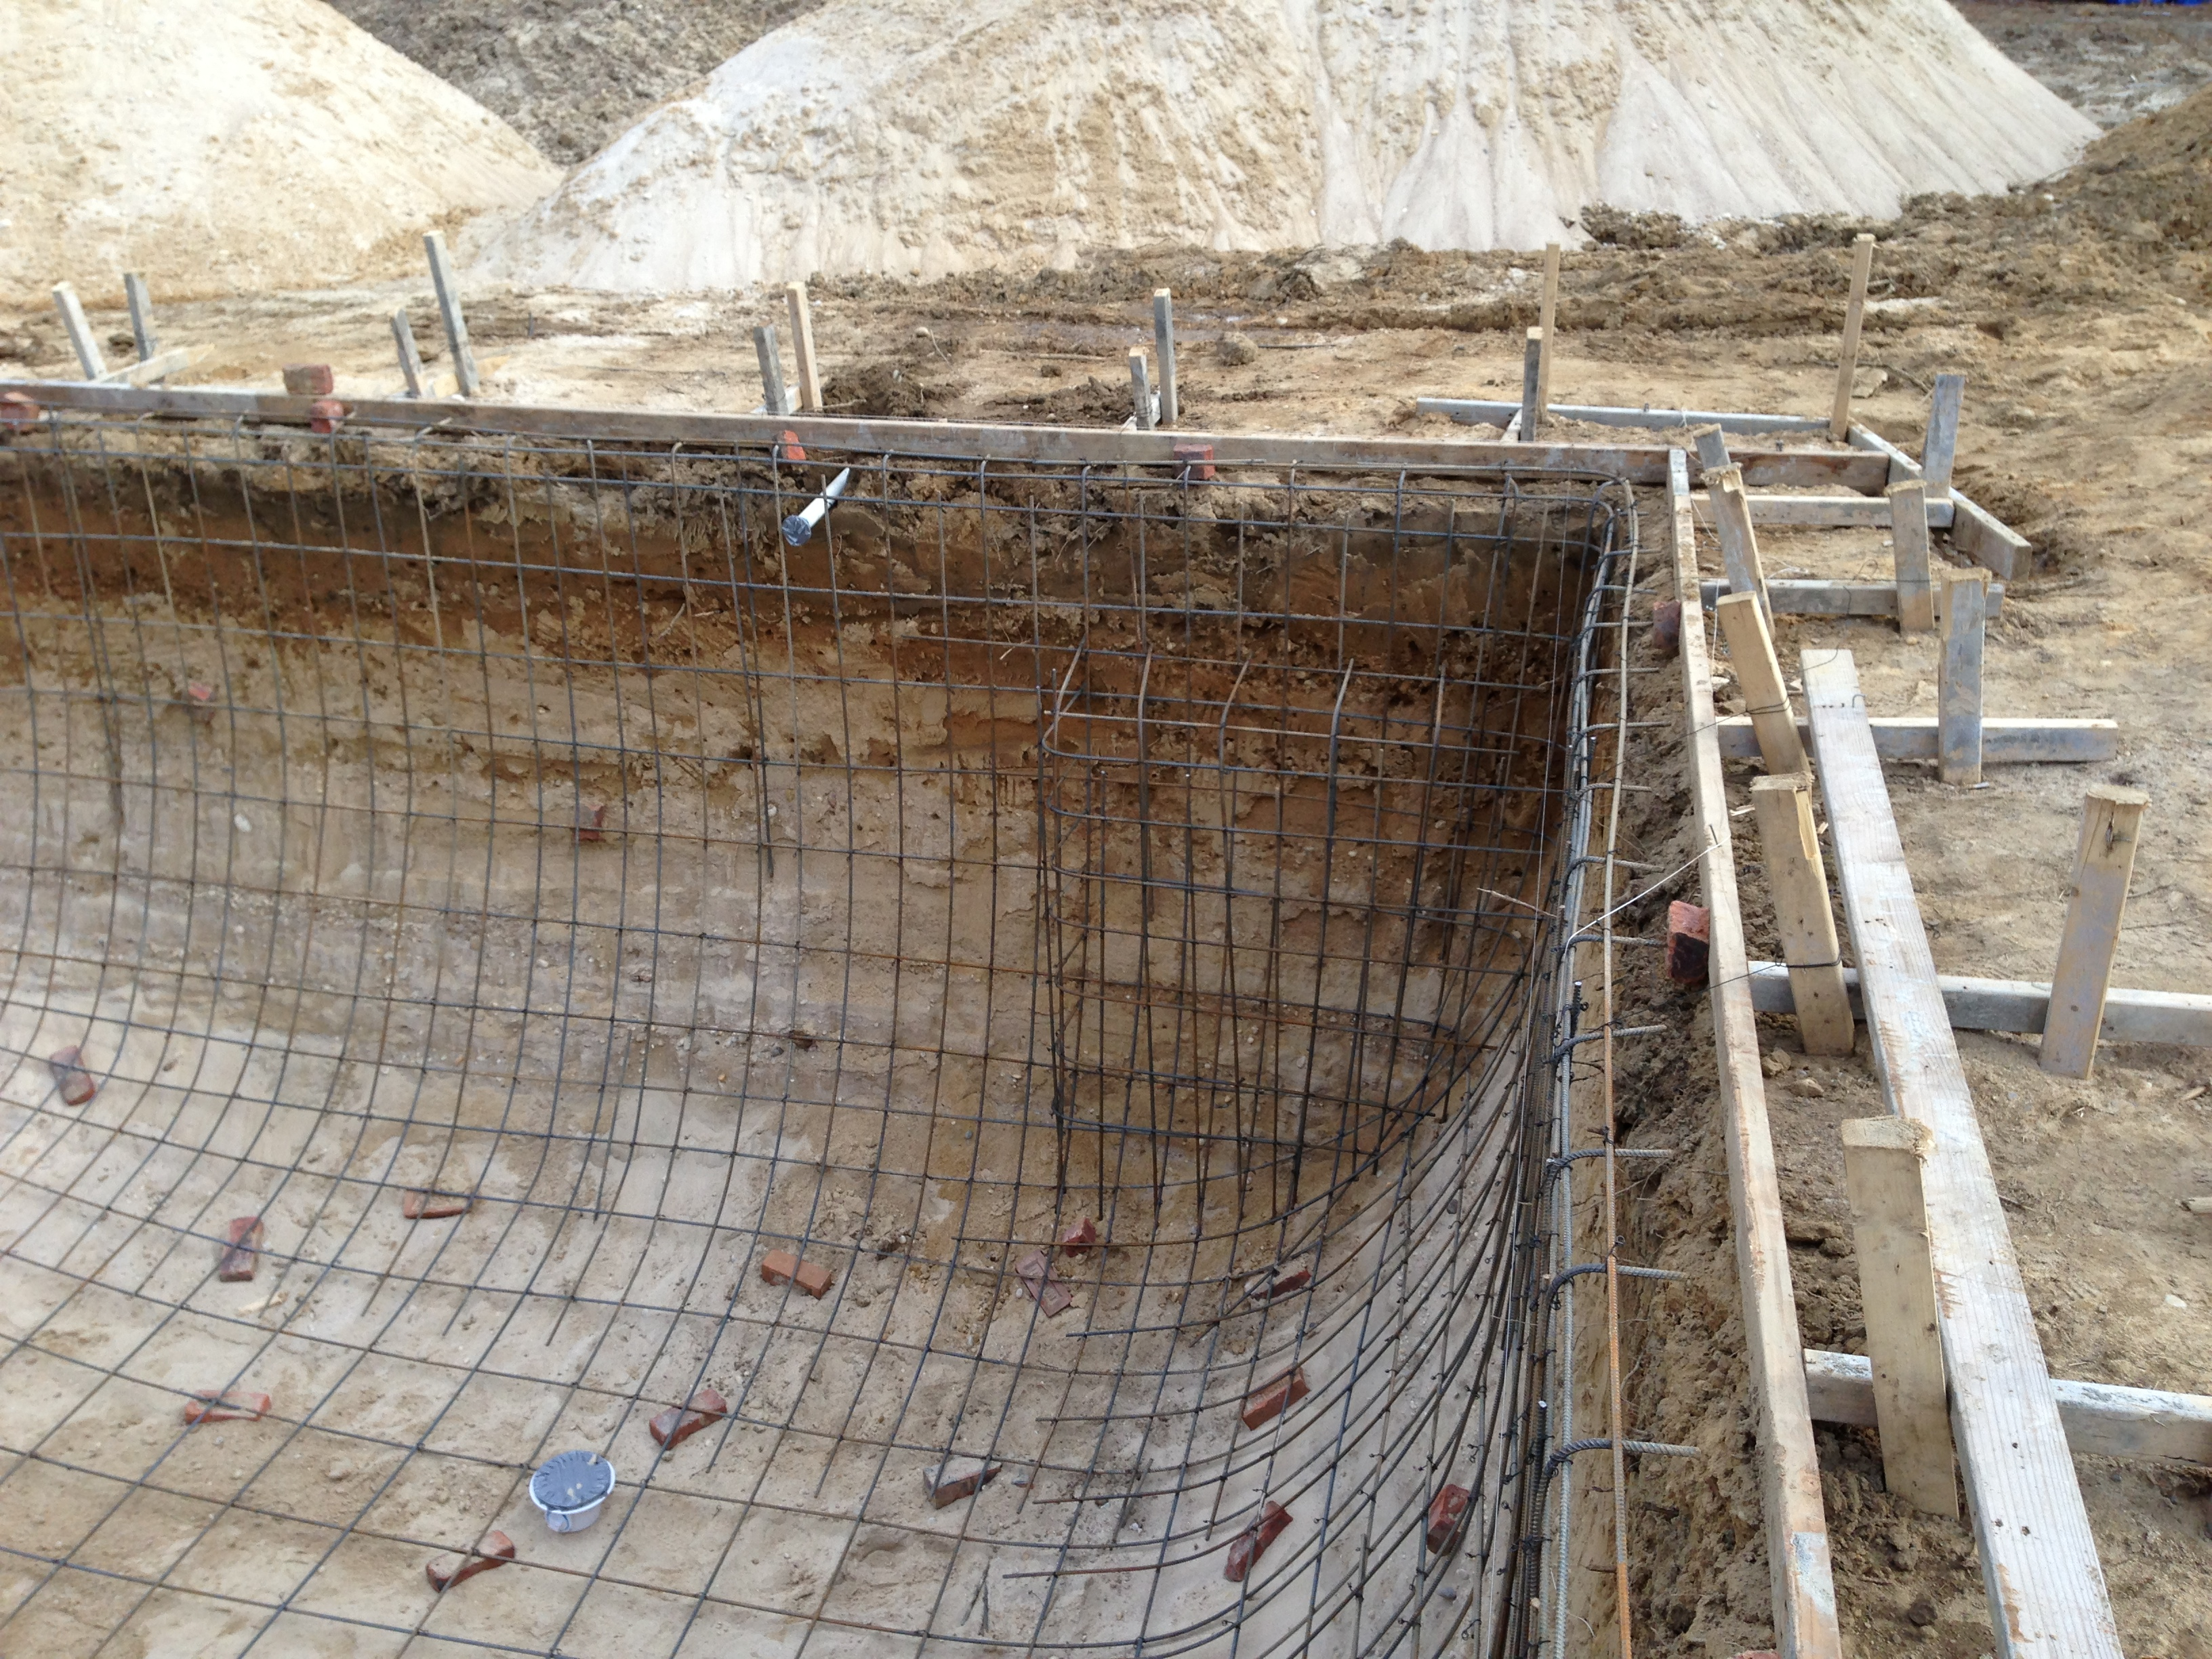 50 Gunite Lap Pool Installation Quogue Ny Patricks